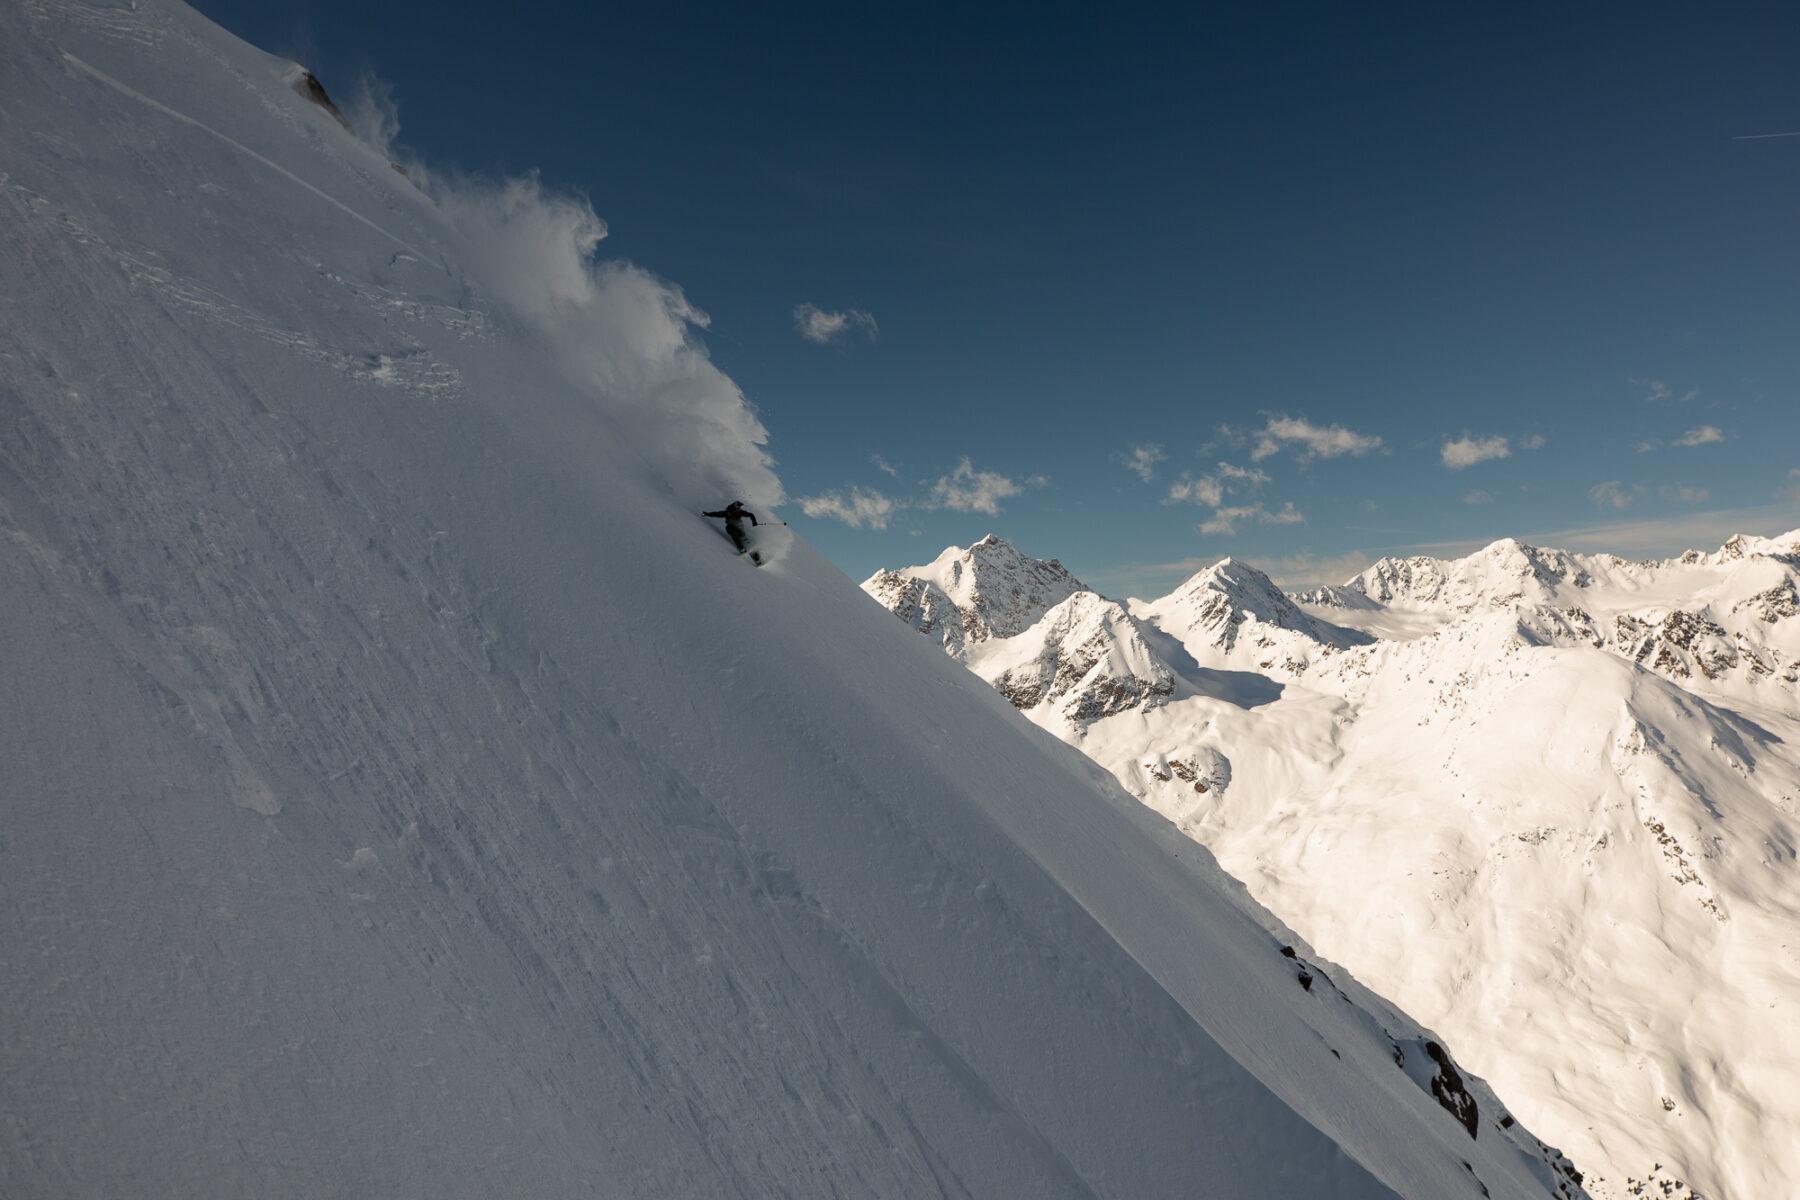 Fabi Lentsch Skiing Big Mountain Dream Lines